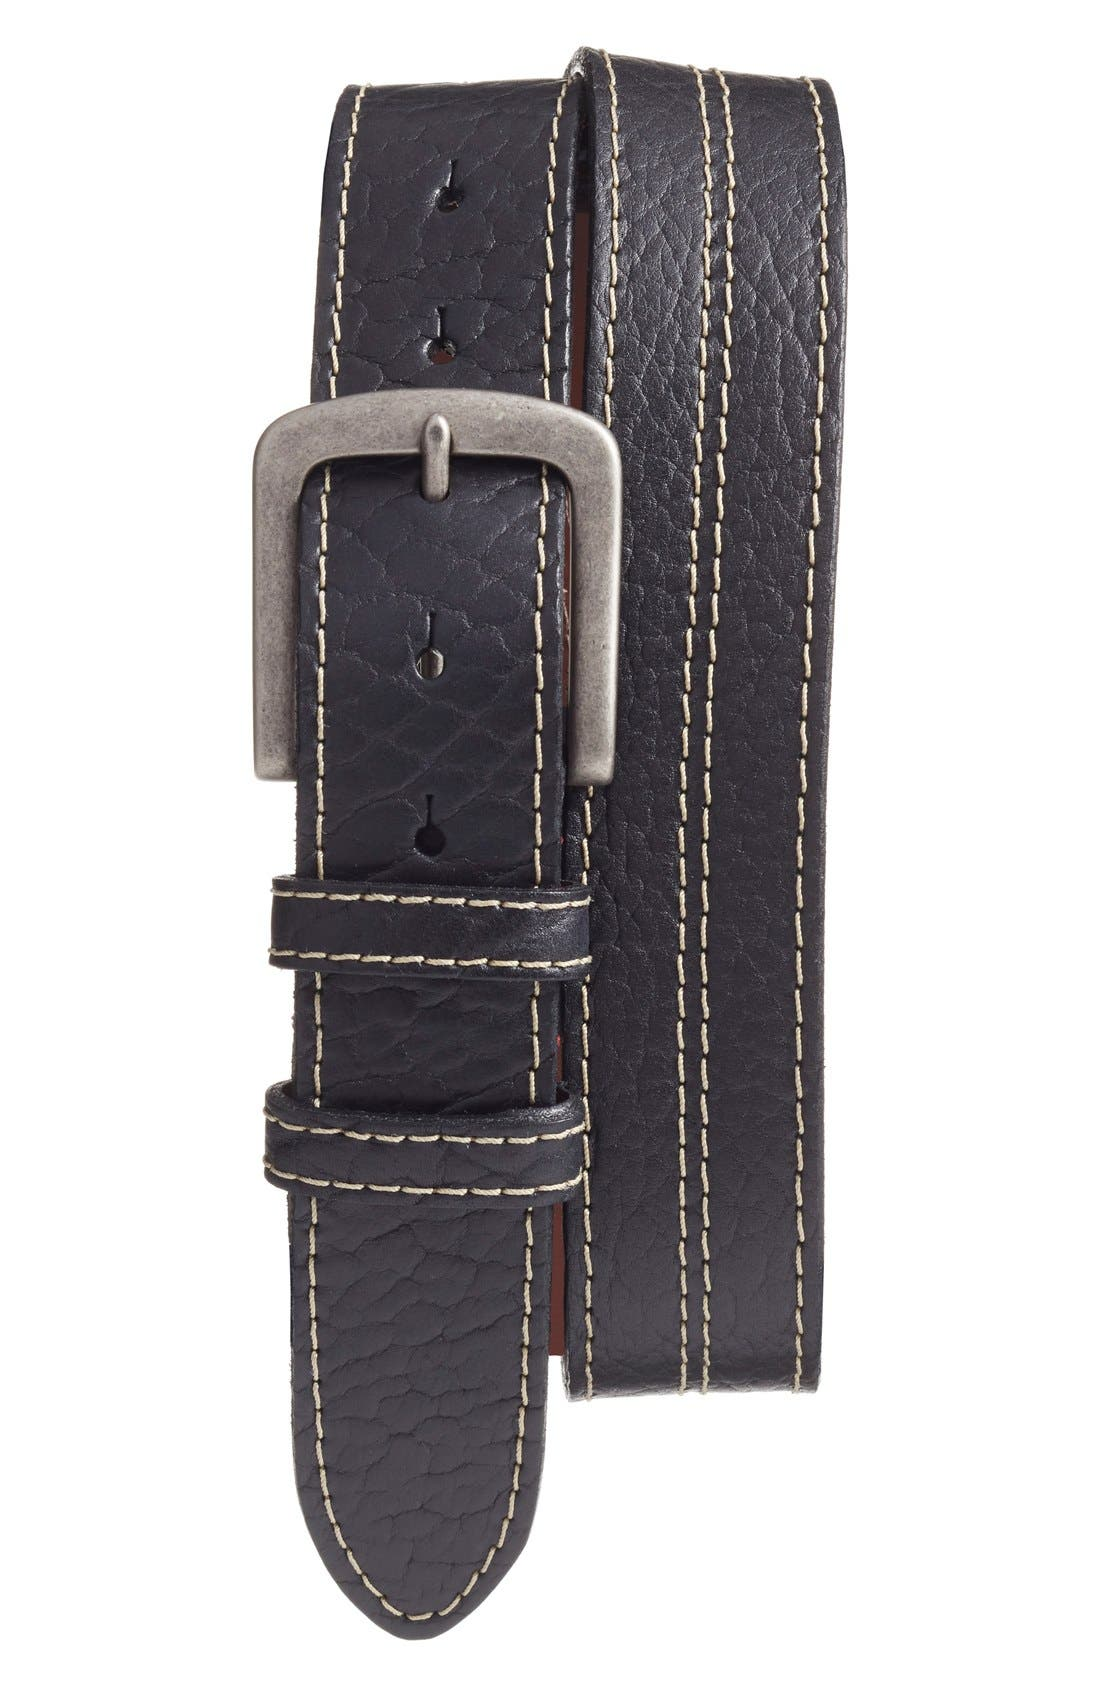 Bison Leather Belt,                             Main thumbnail 1, color,                             BLACK